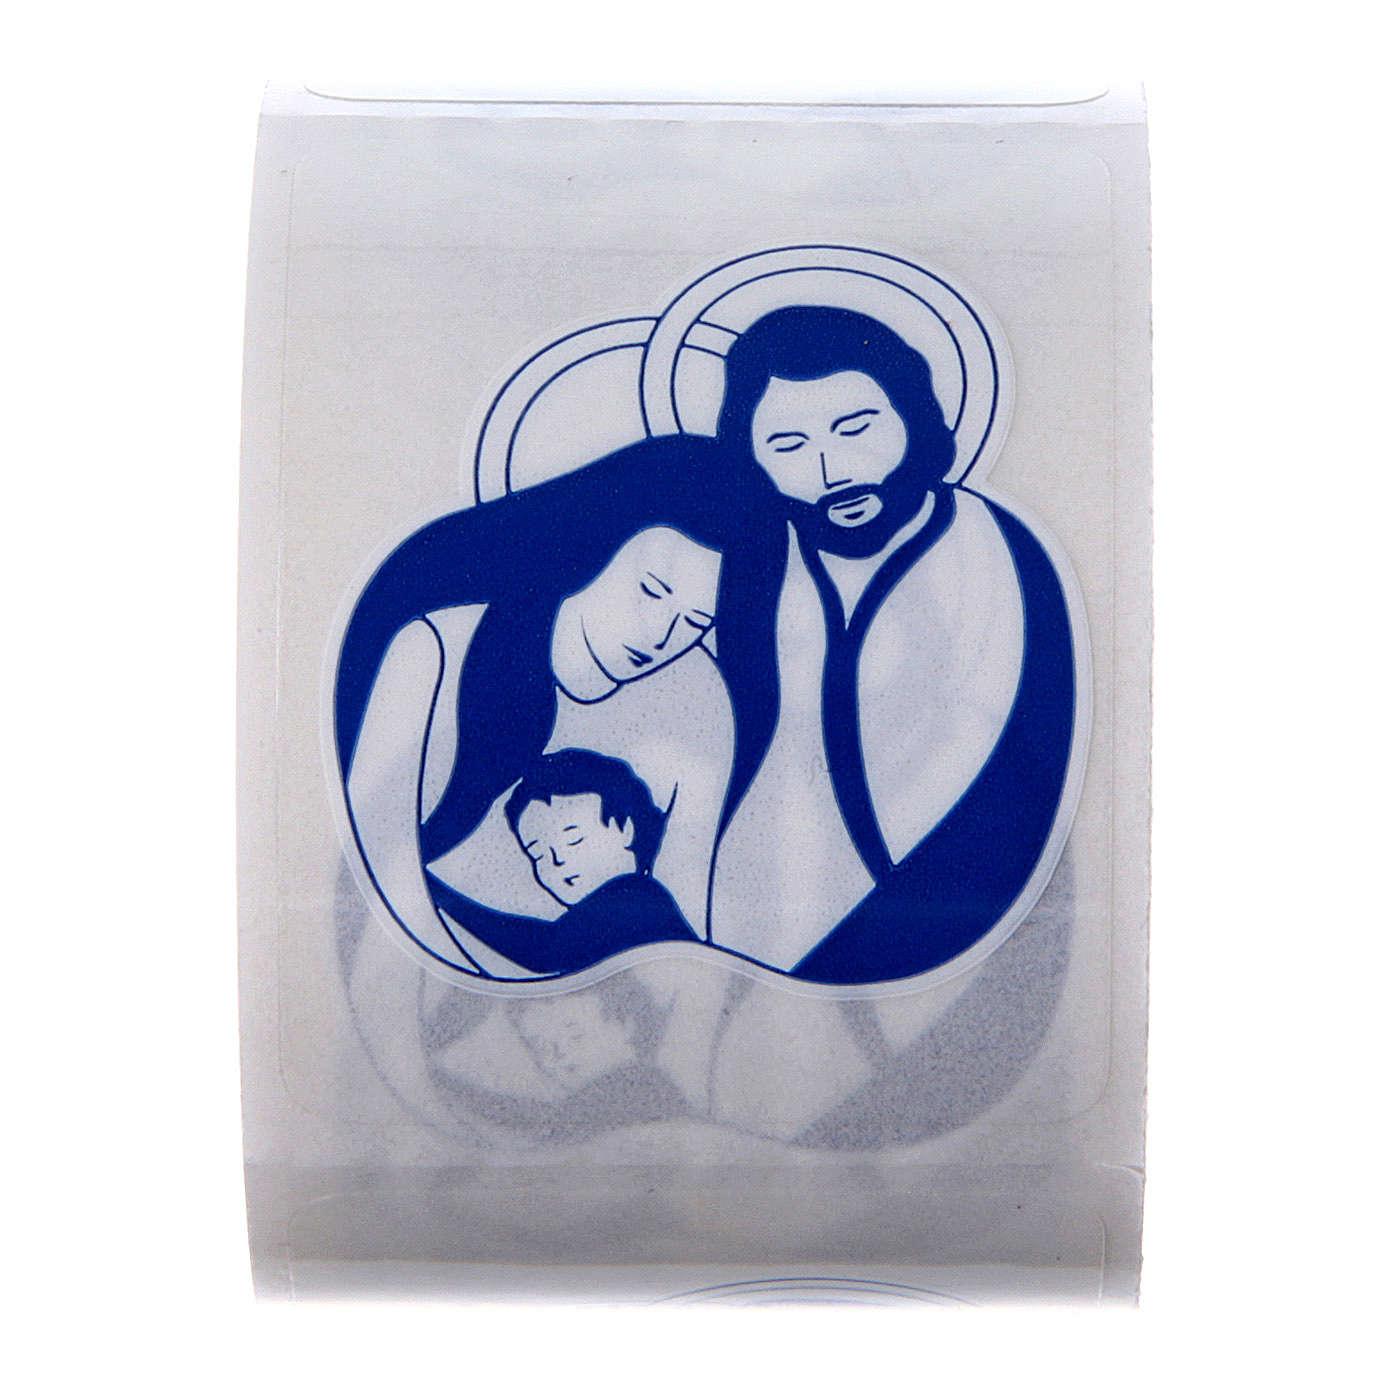 Adesivi Sacra Famiglia 100 pz. per bottiglie acqua santa 3